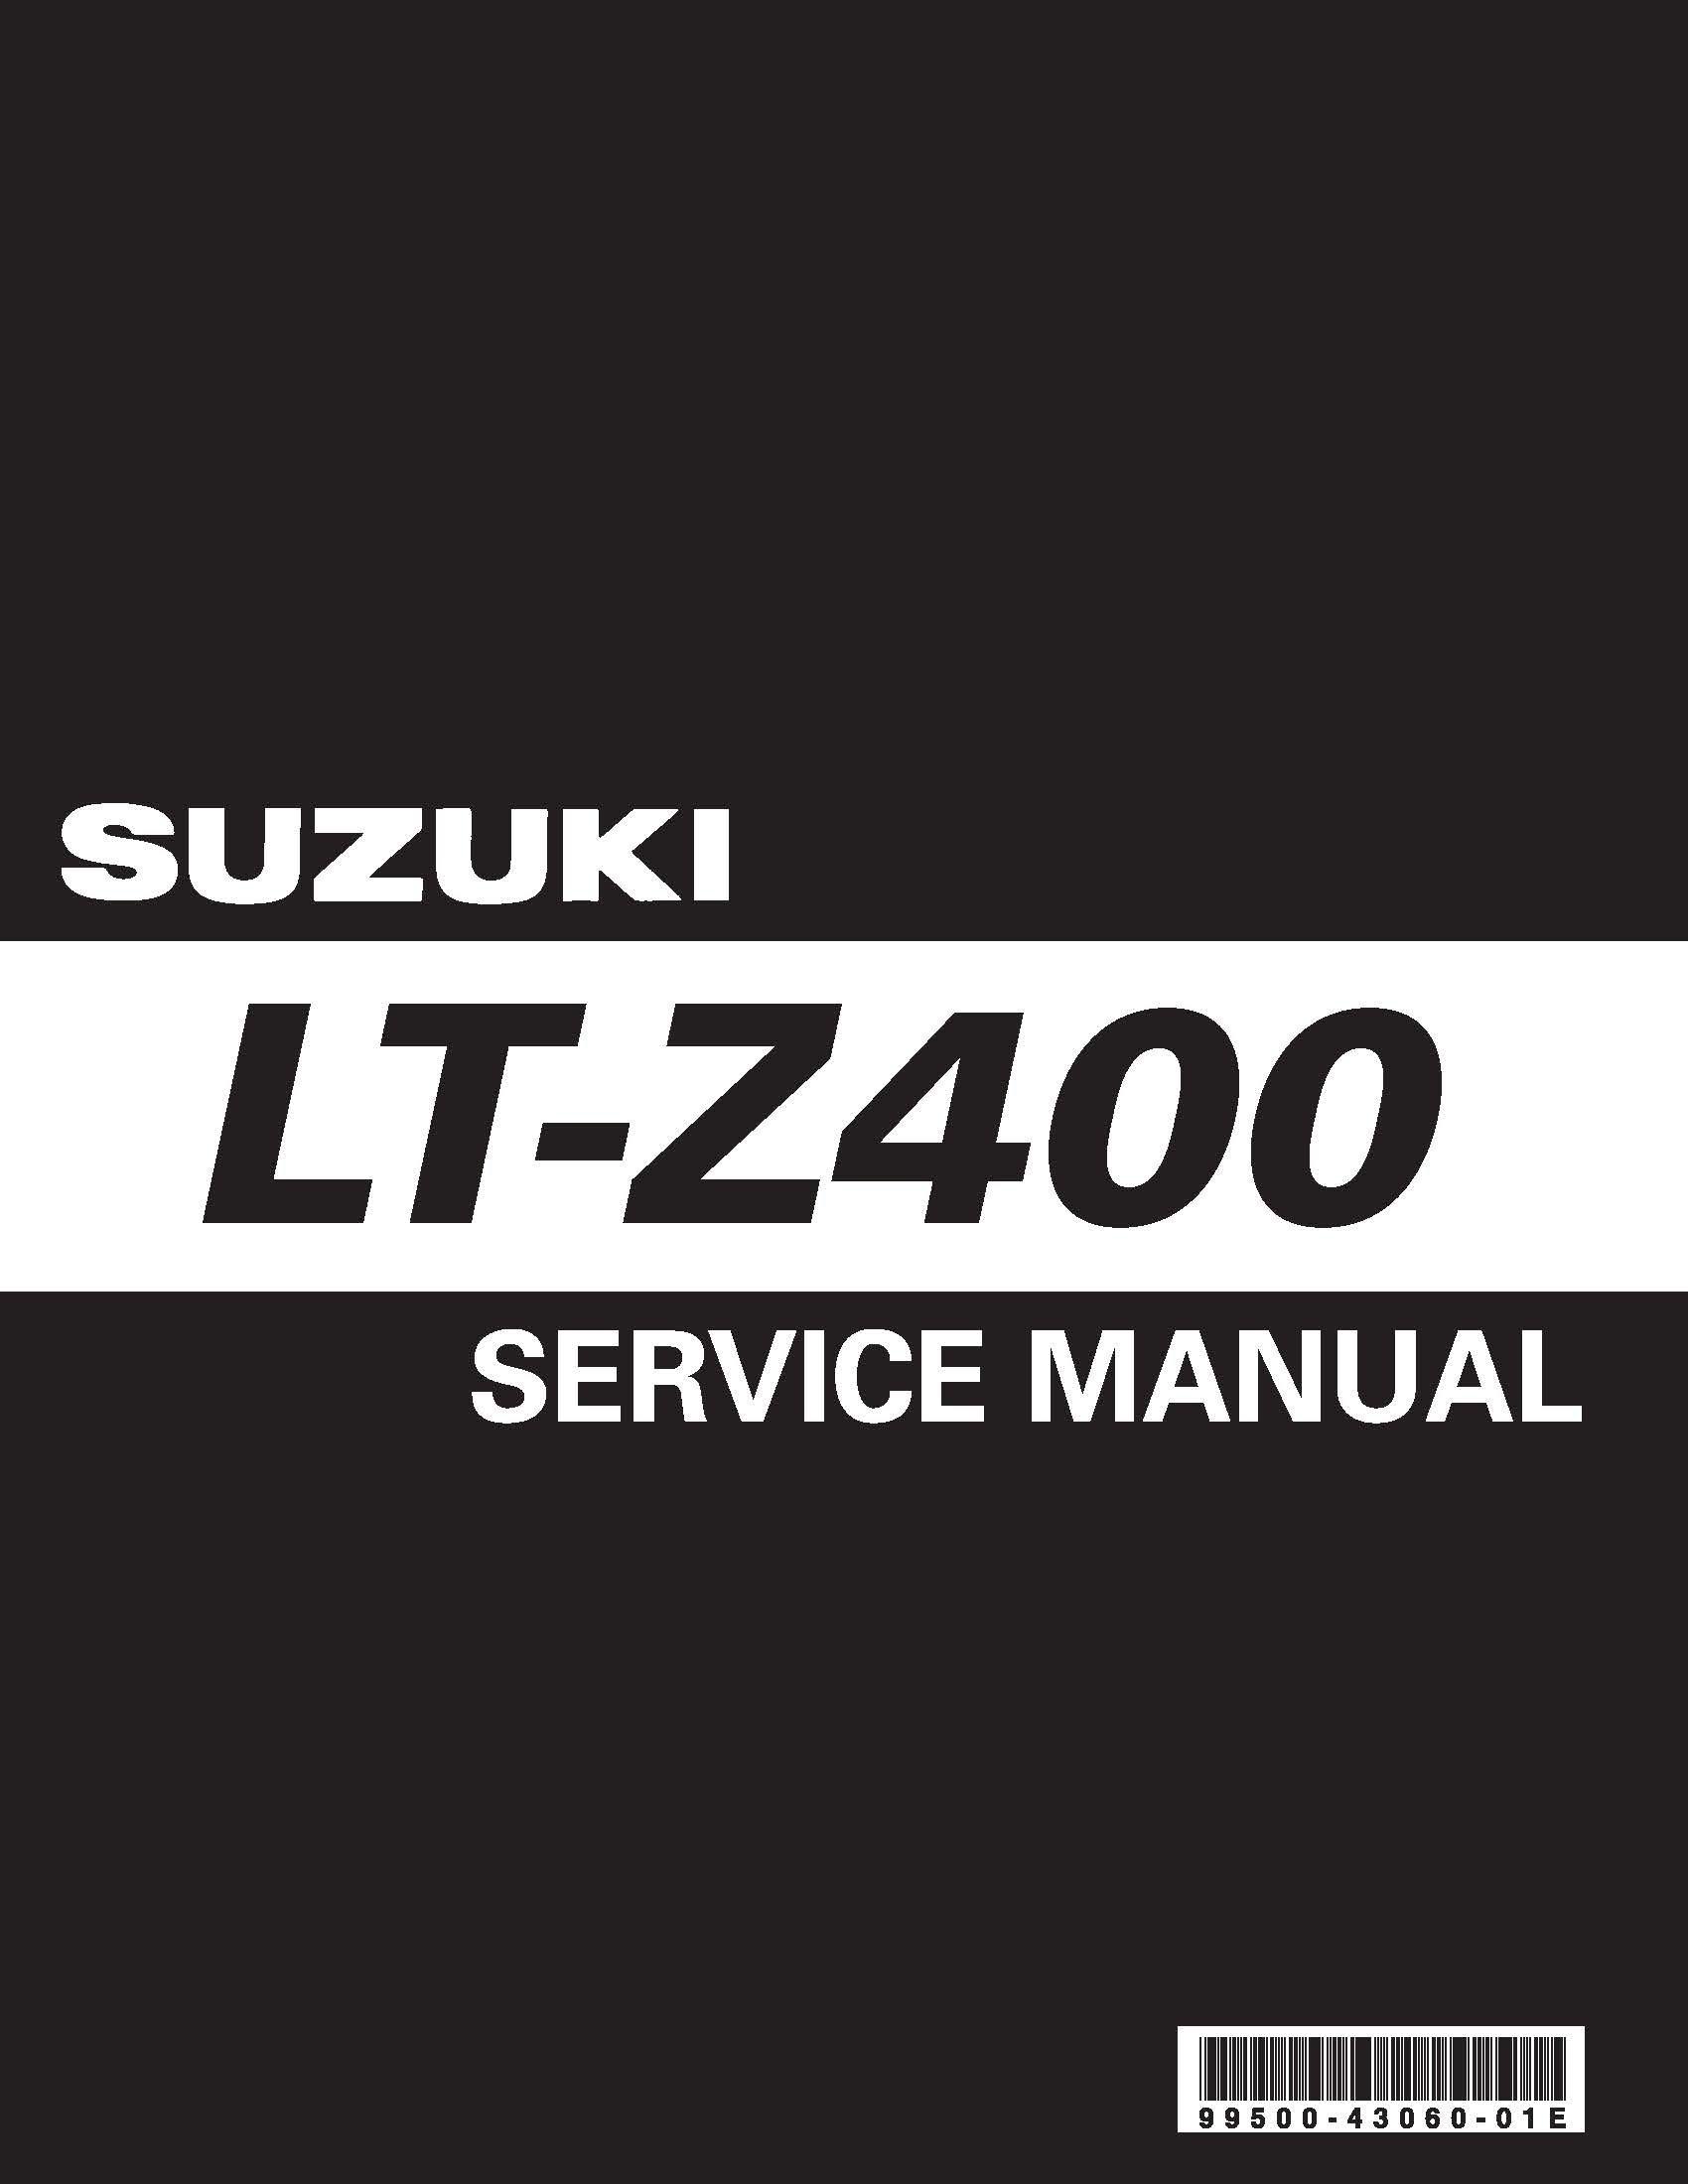 Rca J25420 Manual Ebook Ford Wiring Diagrams 3 2008 Focus Diagram Emprendedor Array Bose 901 Serie Vi Espa C3 B1ol Data U2022 Rh Mikeadkinsguitar